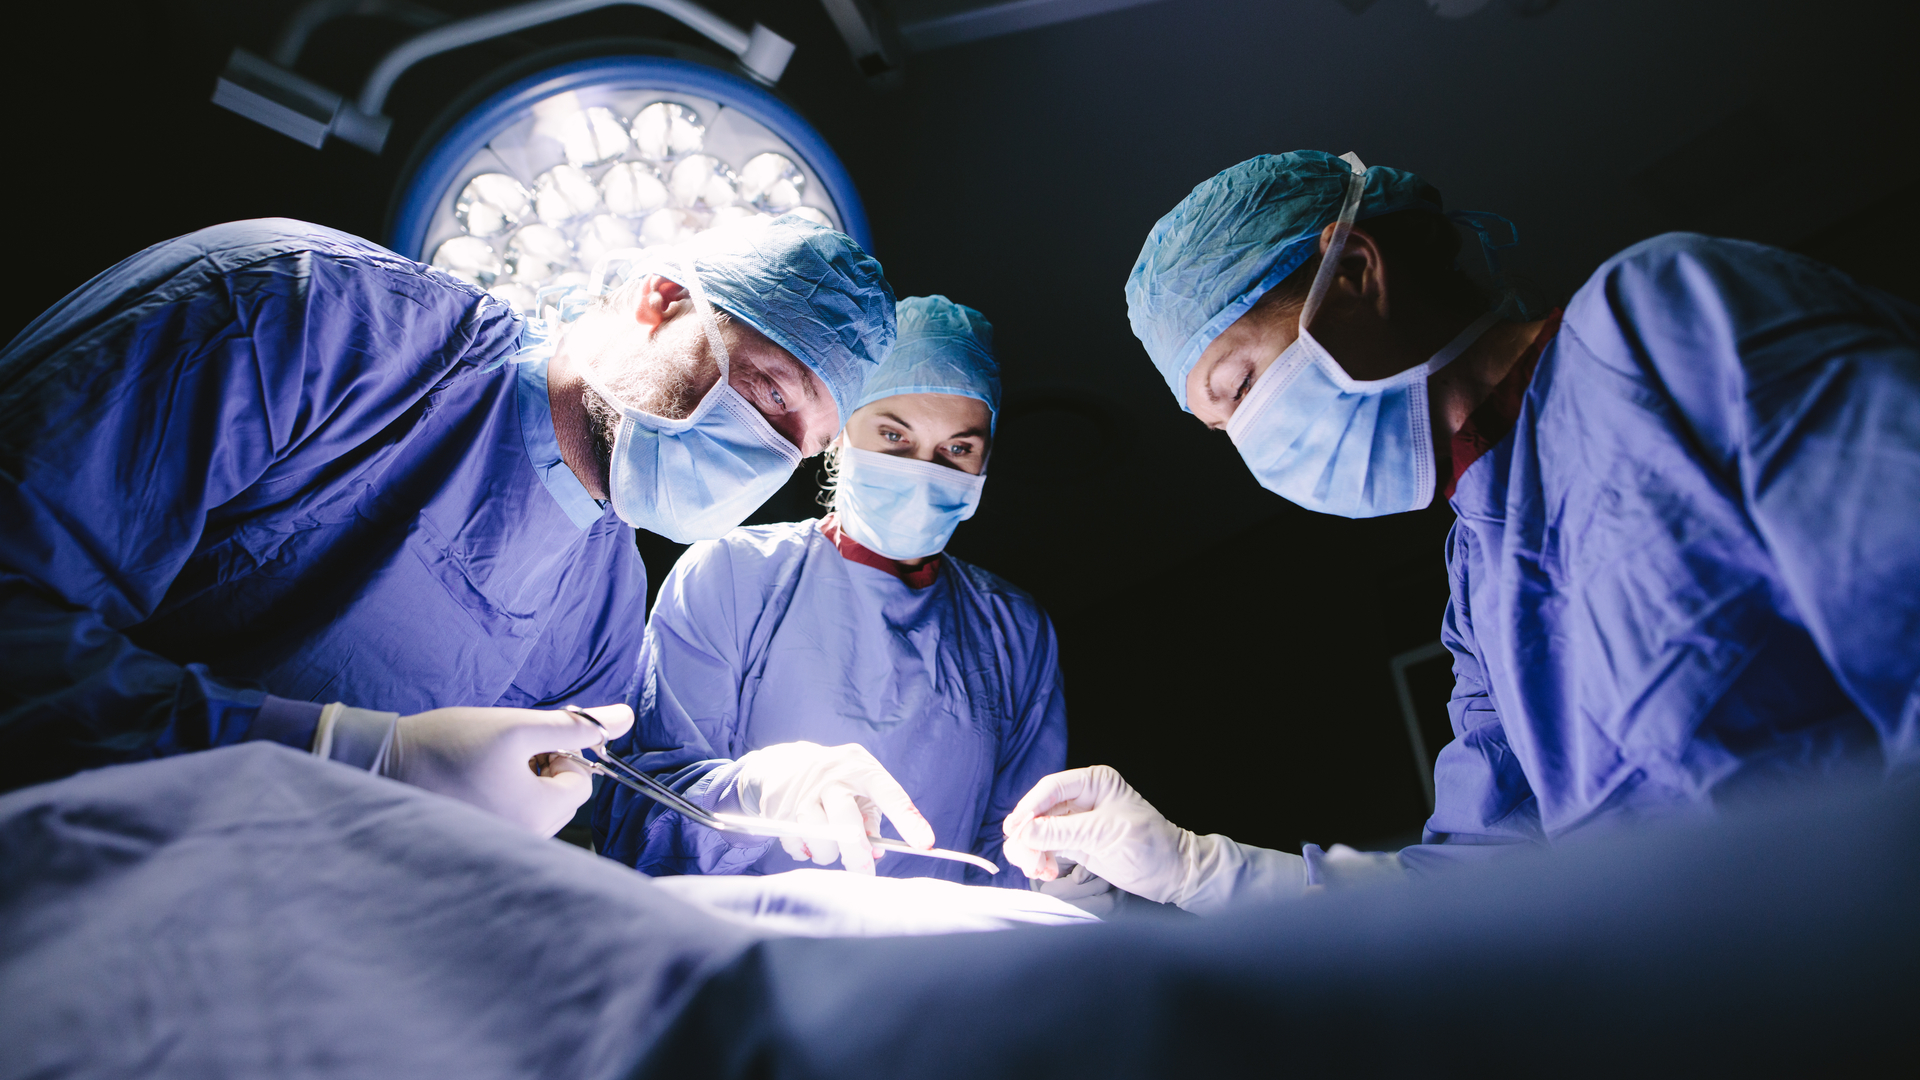 В отношении врача возбудили дело за установку пациентке с переломом б/у пластины